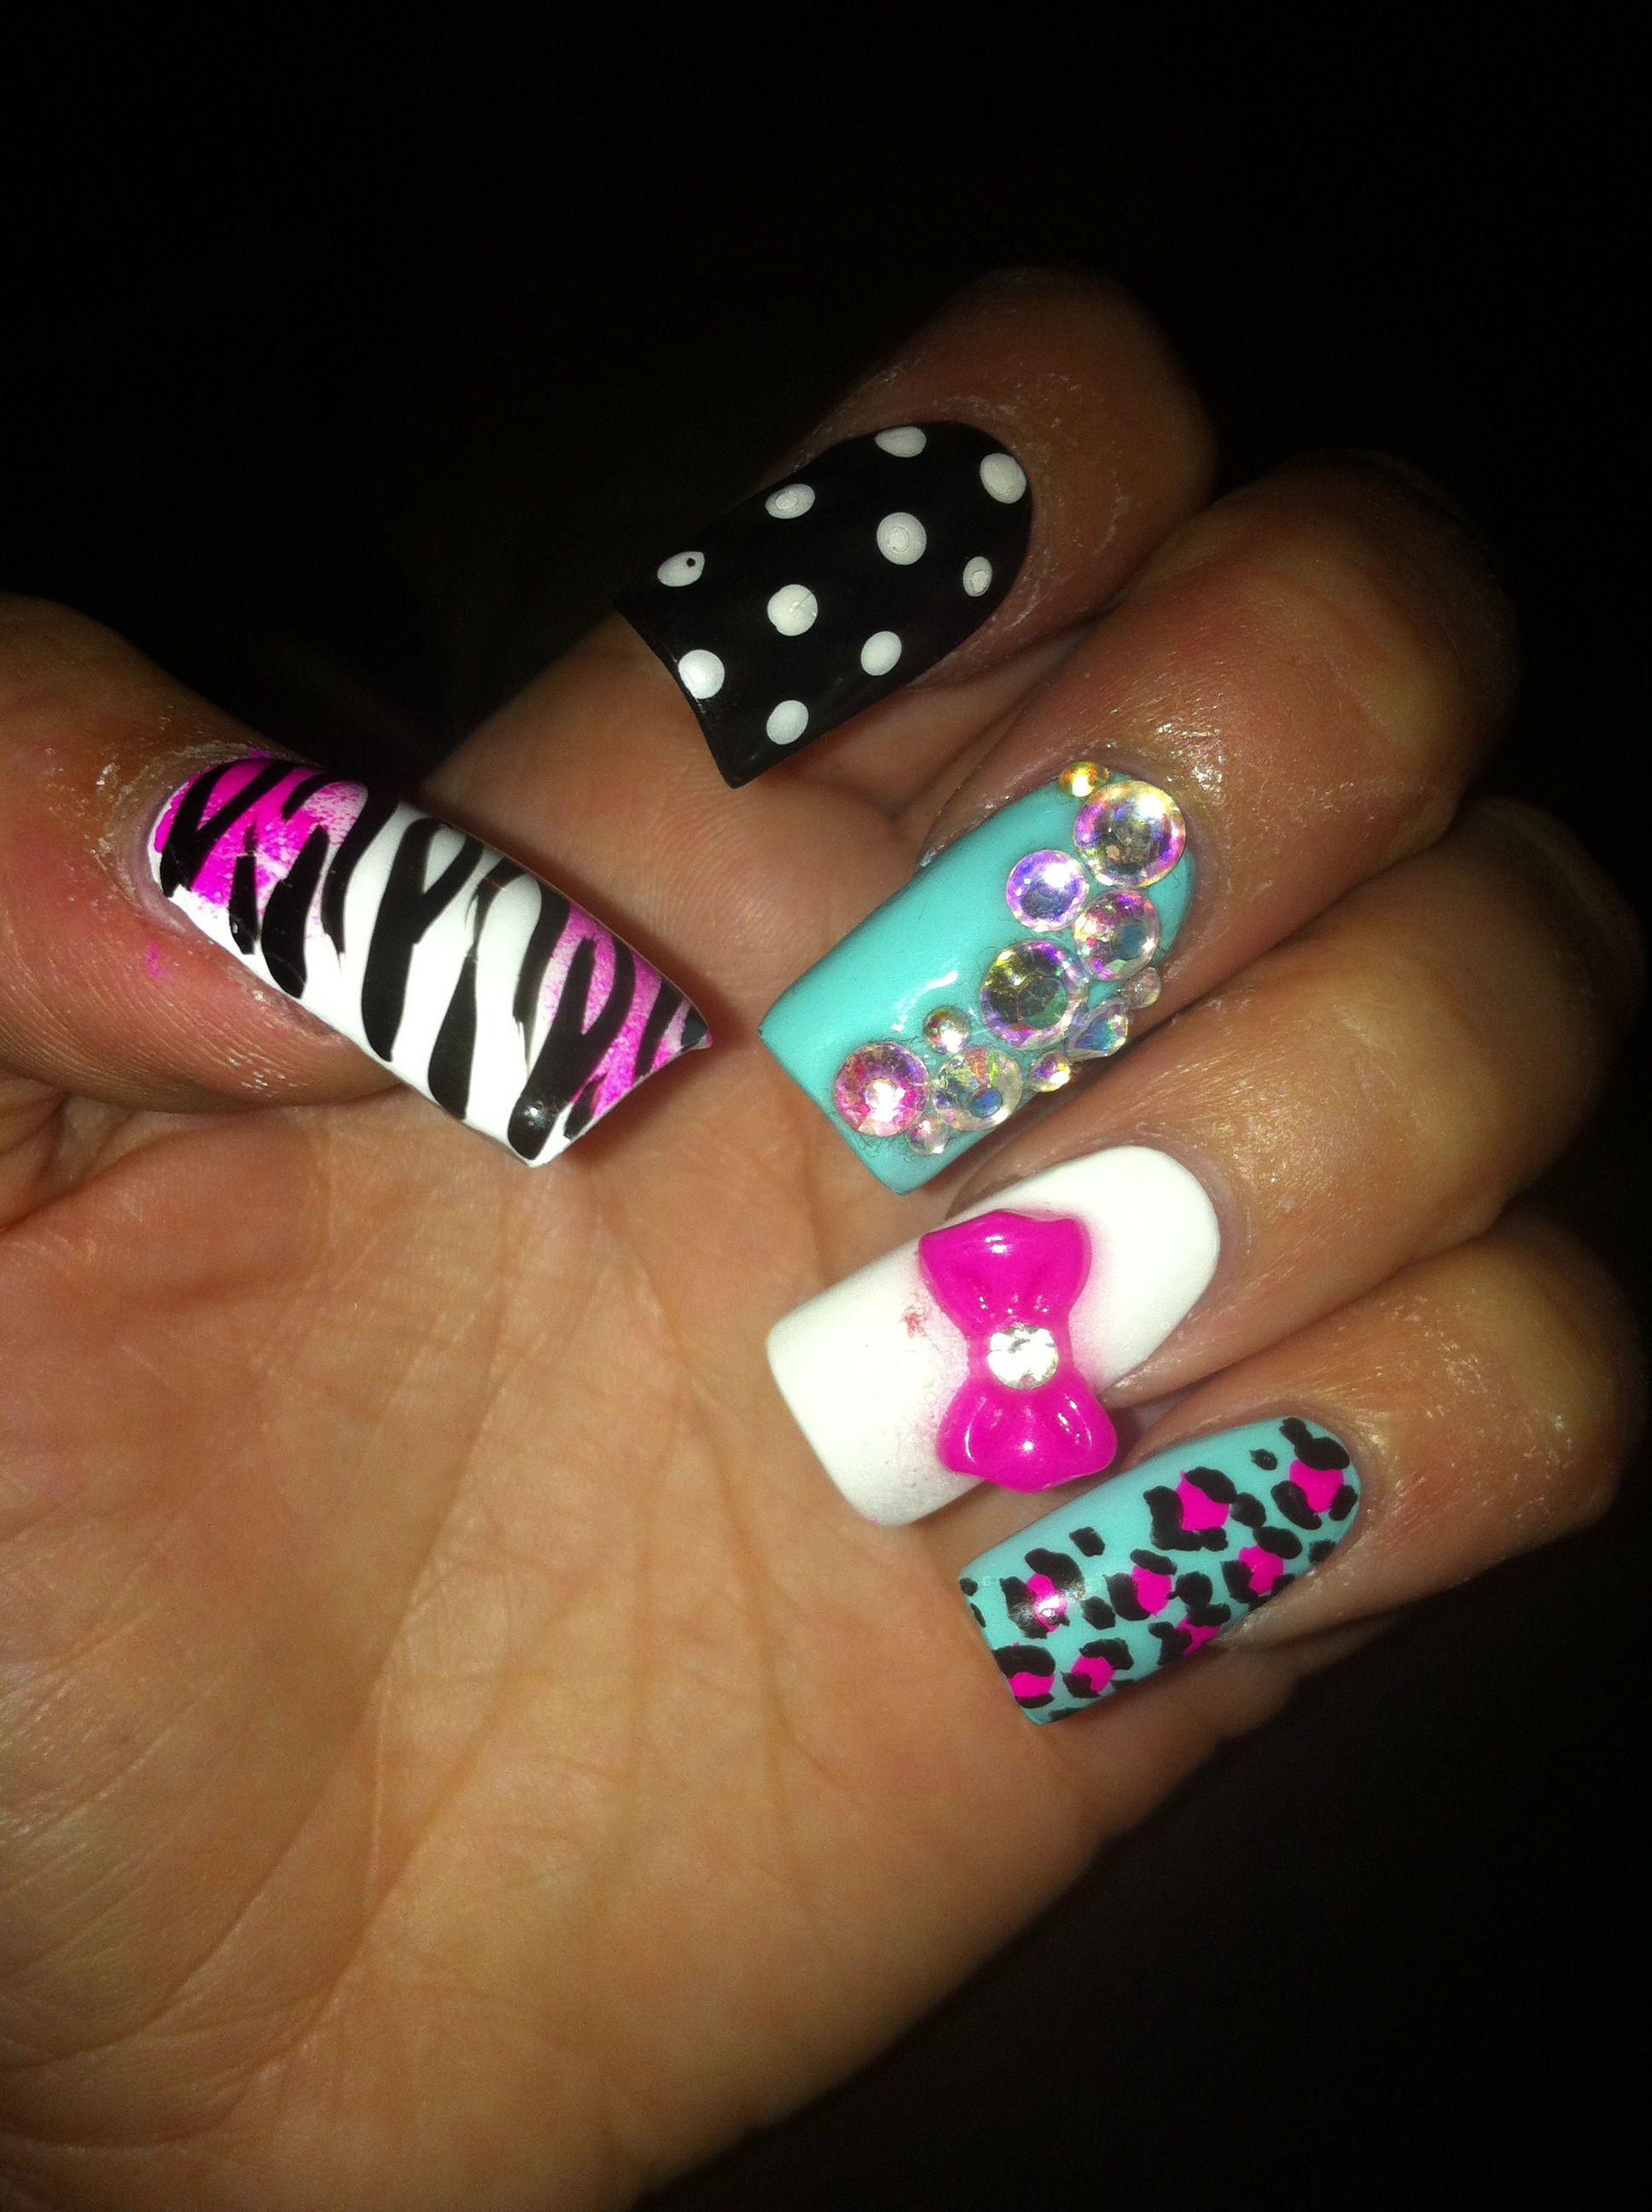 pink blue 3d bow nails nails pinterest pink blue 3d